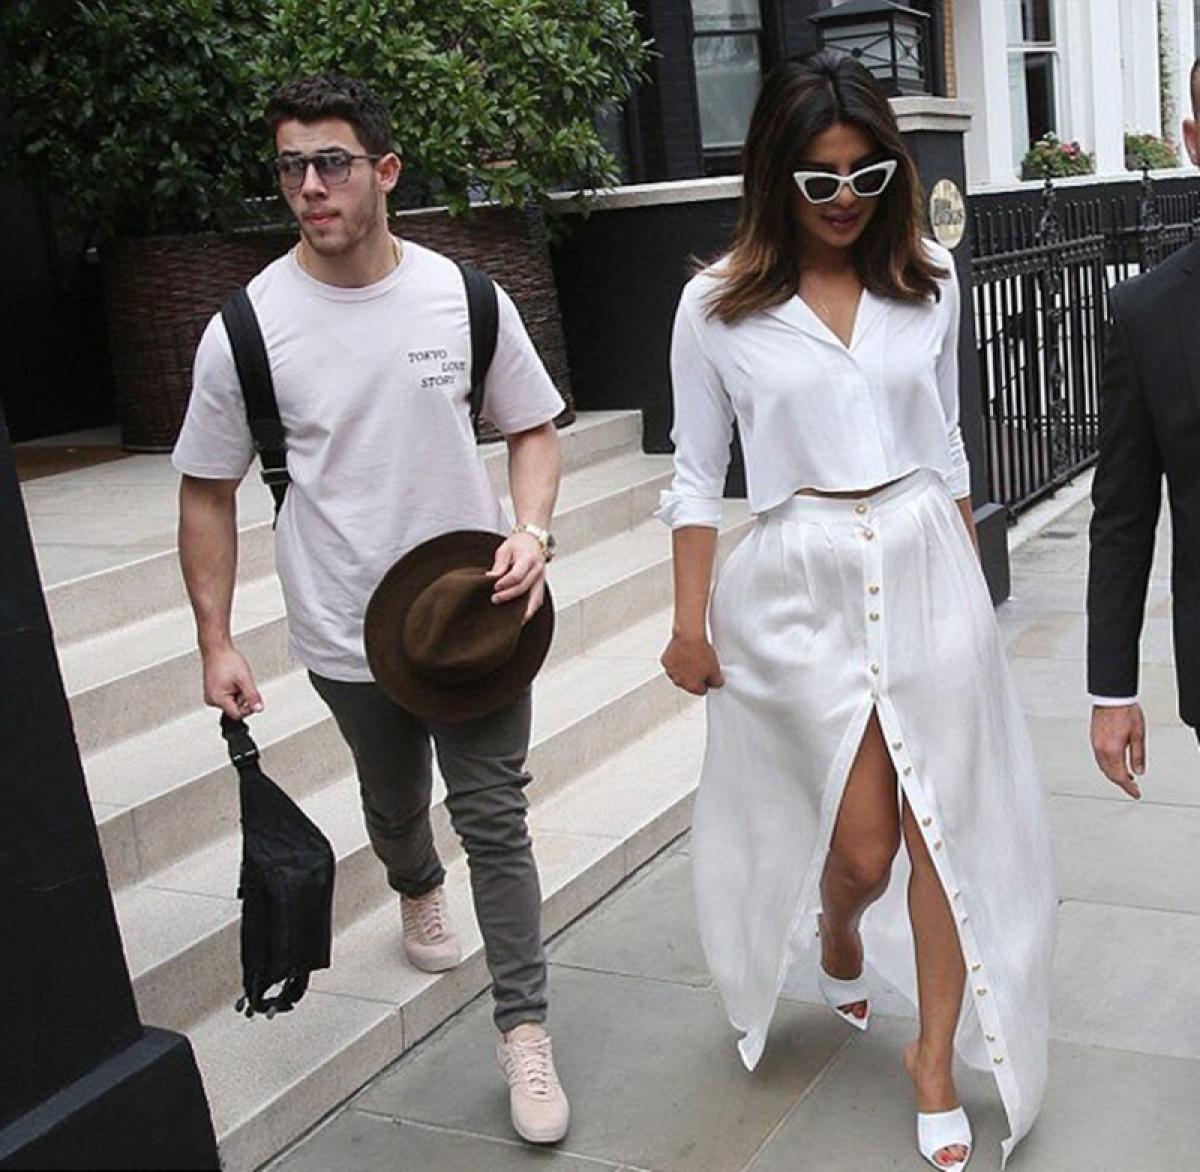 After cozy birthday dinner date, Priyanka Chopra and beau Nick Jonas twin in white in London; see pics